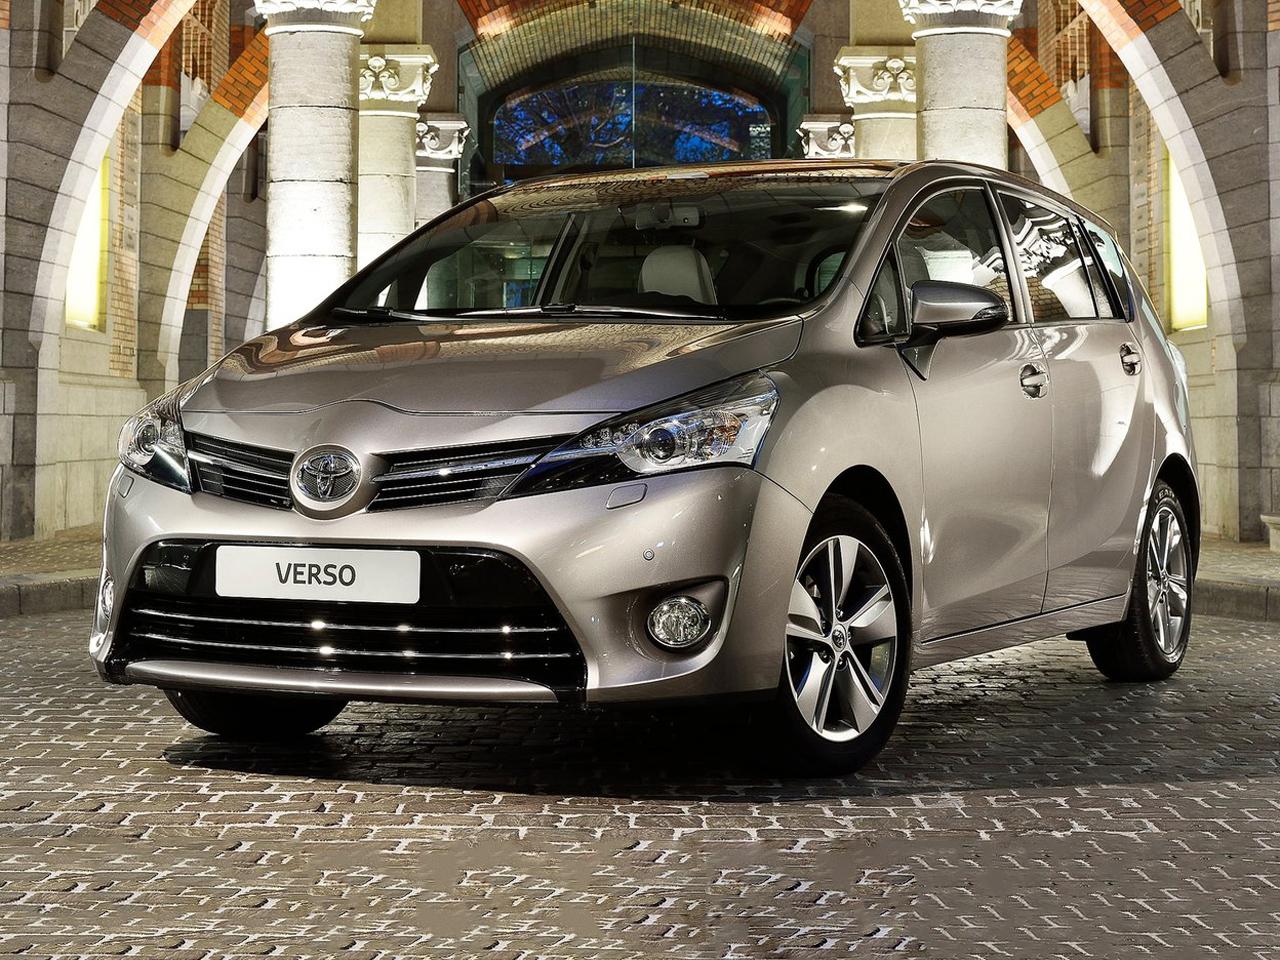 Toyota Verso 2014 115D Advance 7 Plazas -- Autobild.es